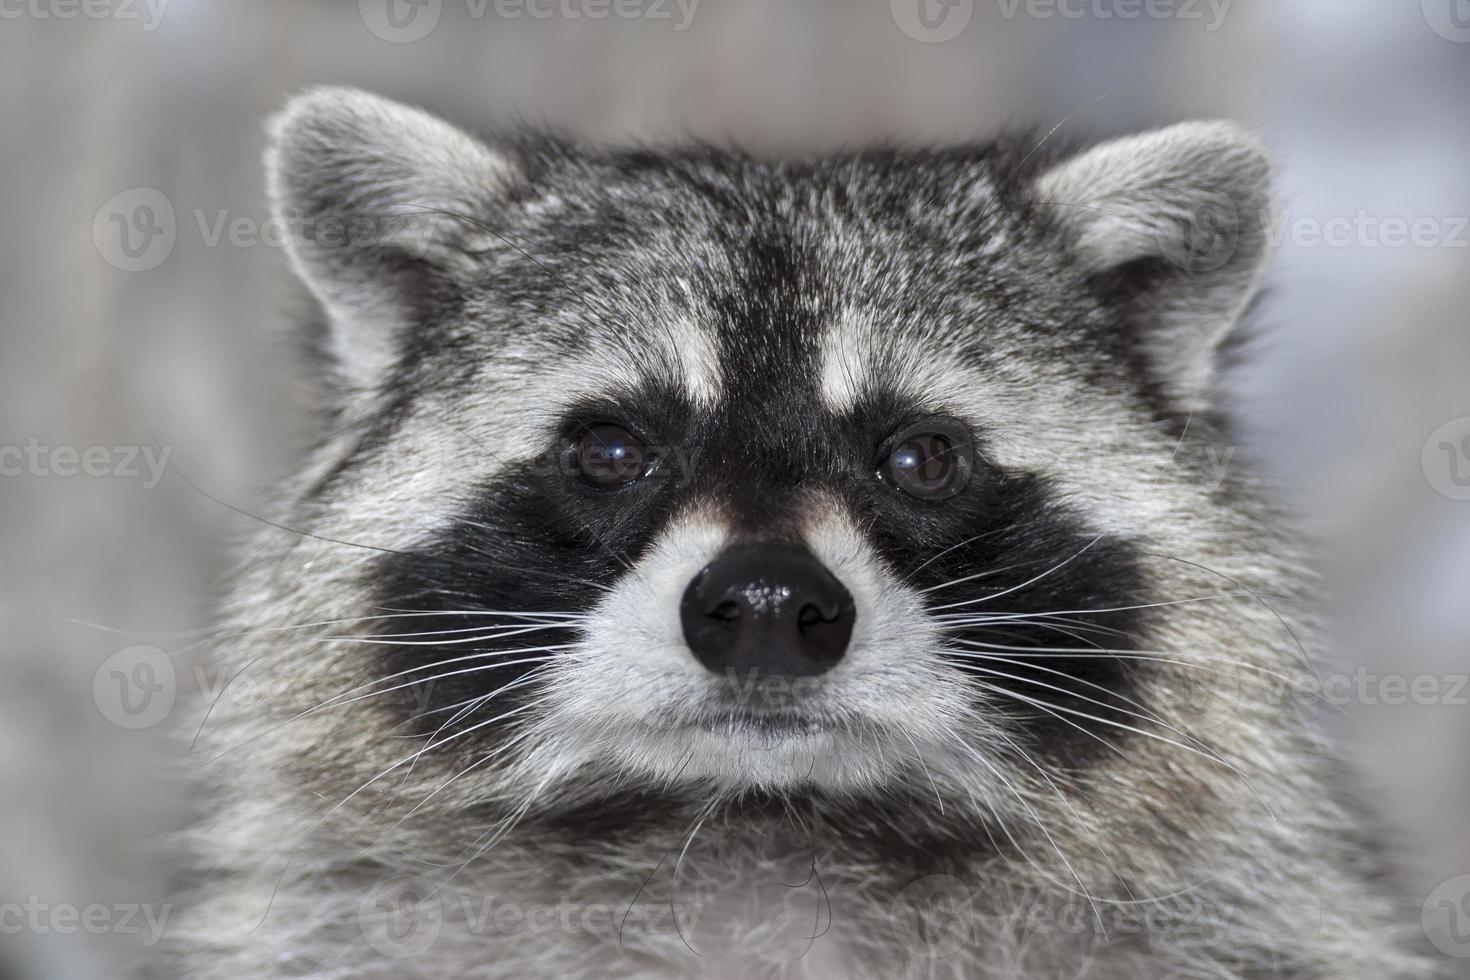 Retrato macro de un mapache. foto